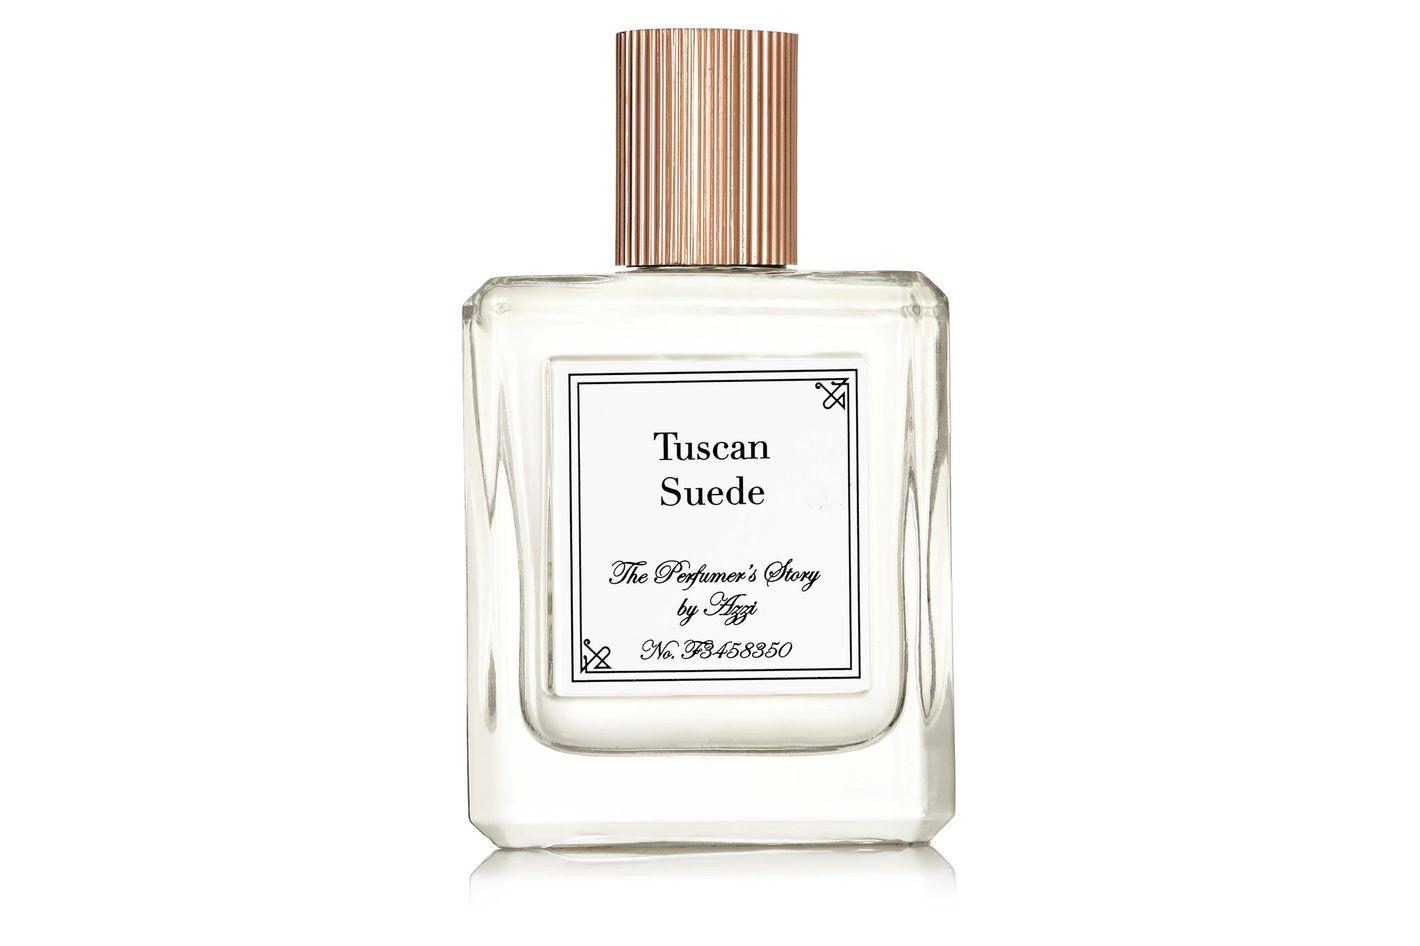 The Perfume's Story by Azzi Glasser Tuscan Suede Eau de Parfum